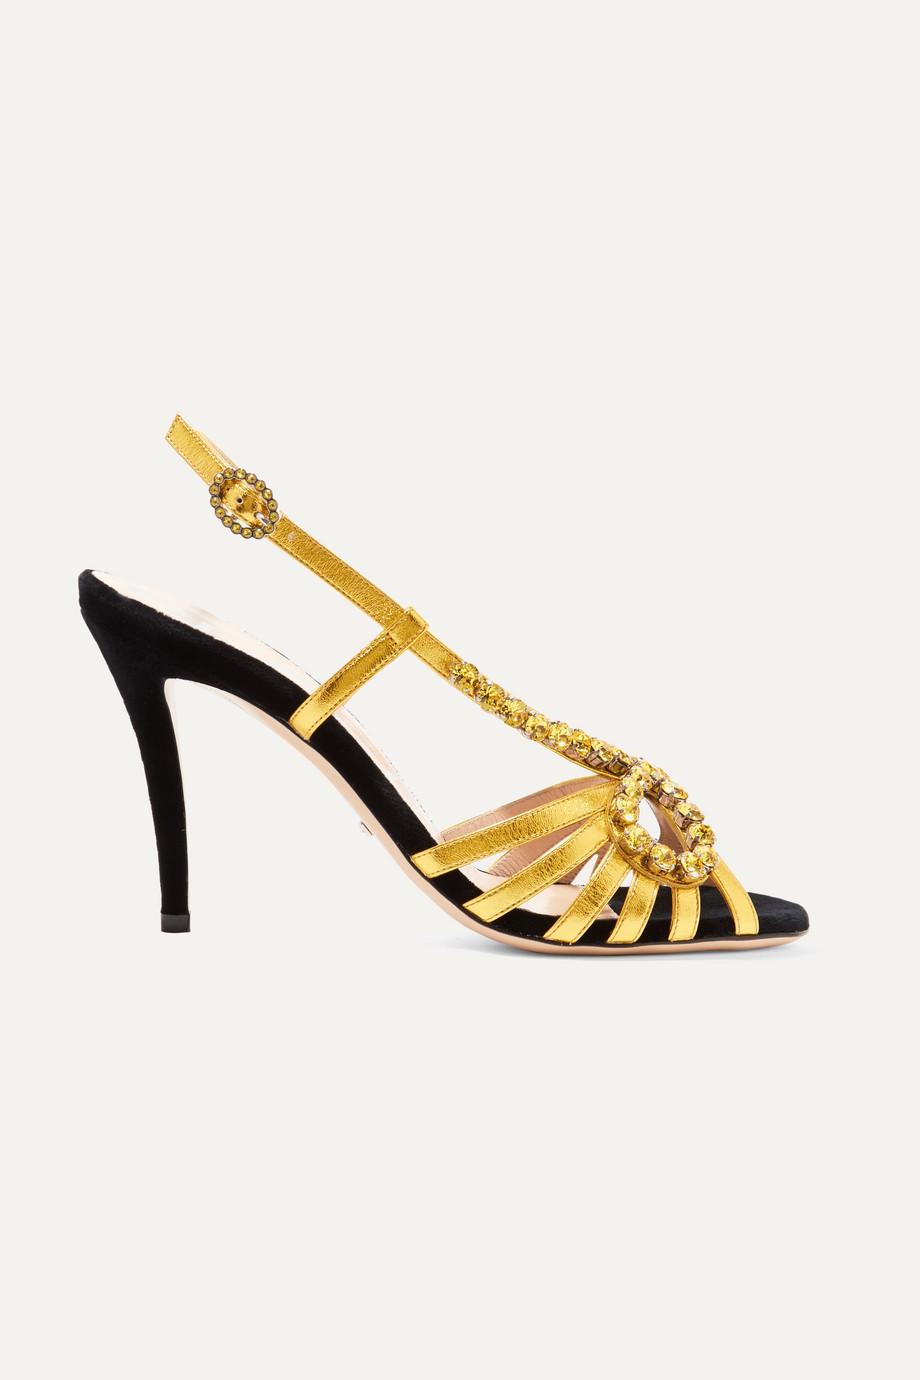 Gucci Crystal-embellished metallic leather sandals